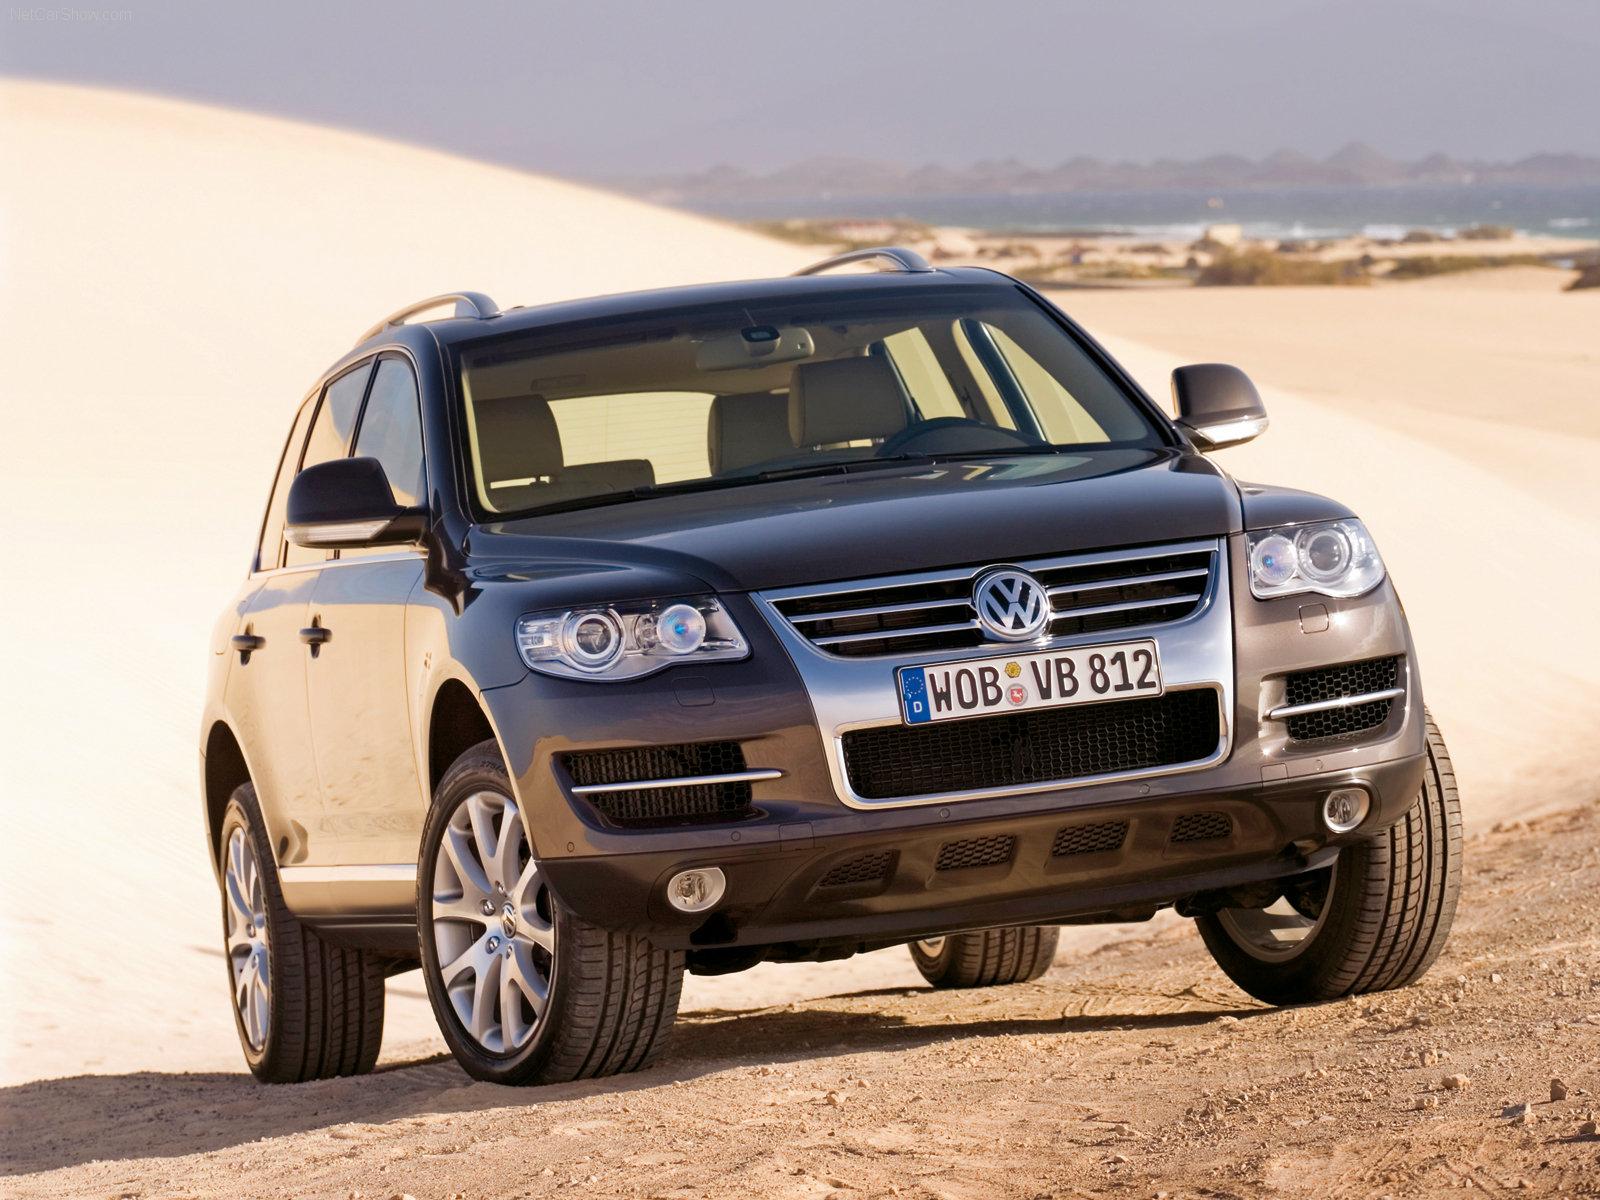 https://w04.ru/foto/Volkswagen-Touareg_2007_1600x1200_wallpaper_04.jpg